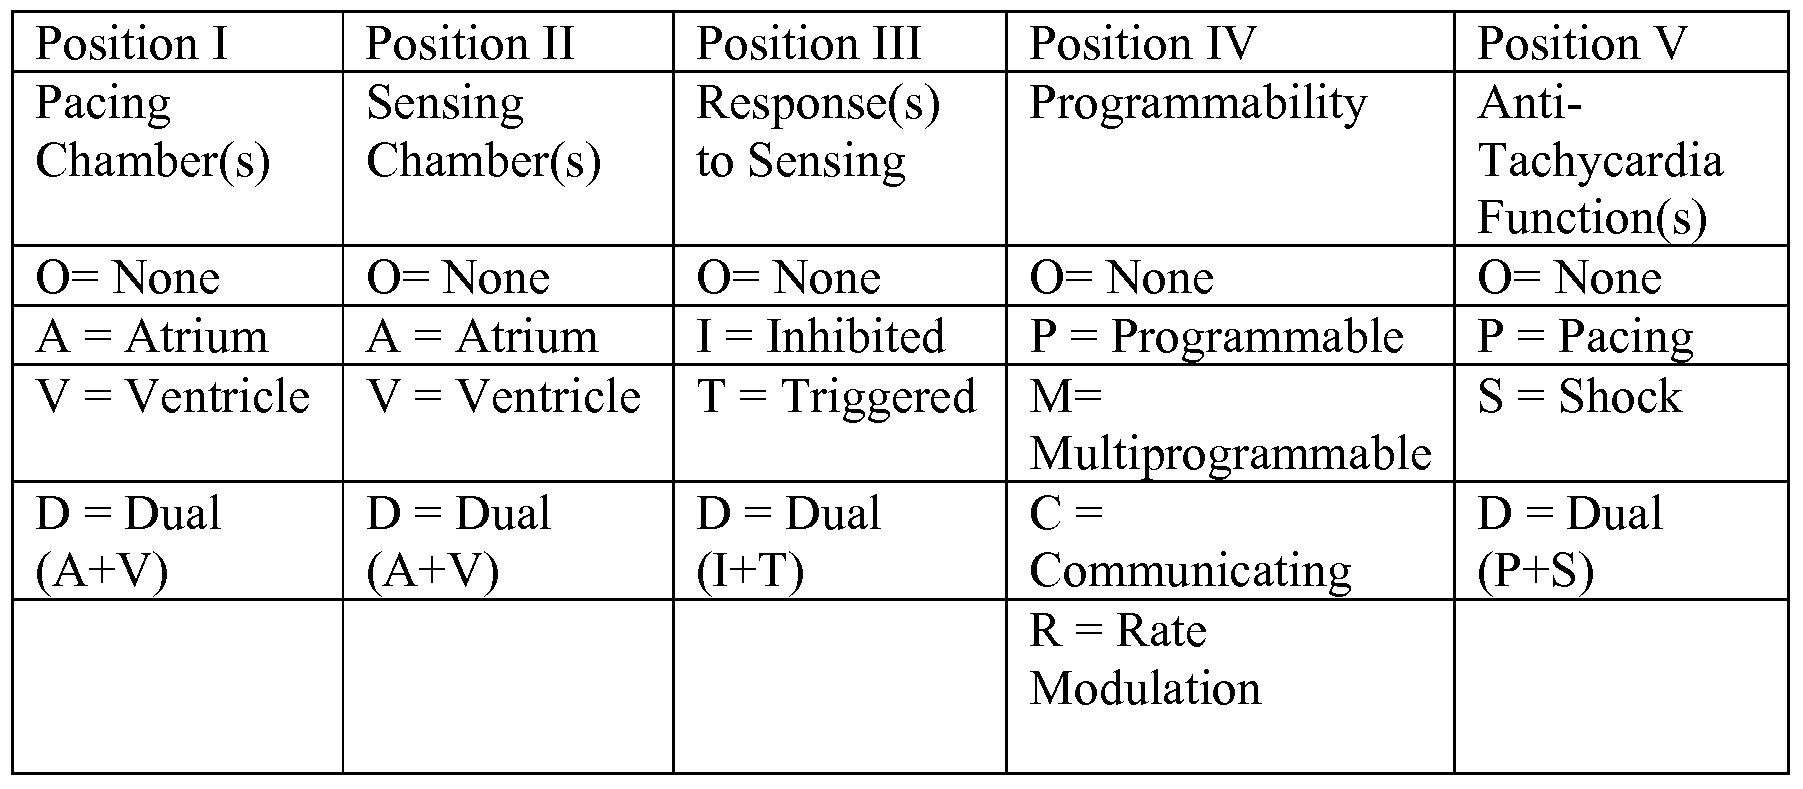 Table 2: NASPE / BPEG Generic Pacemaker Code (NBG)